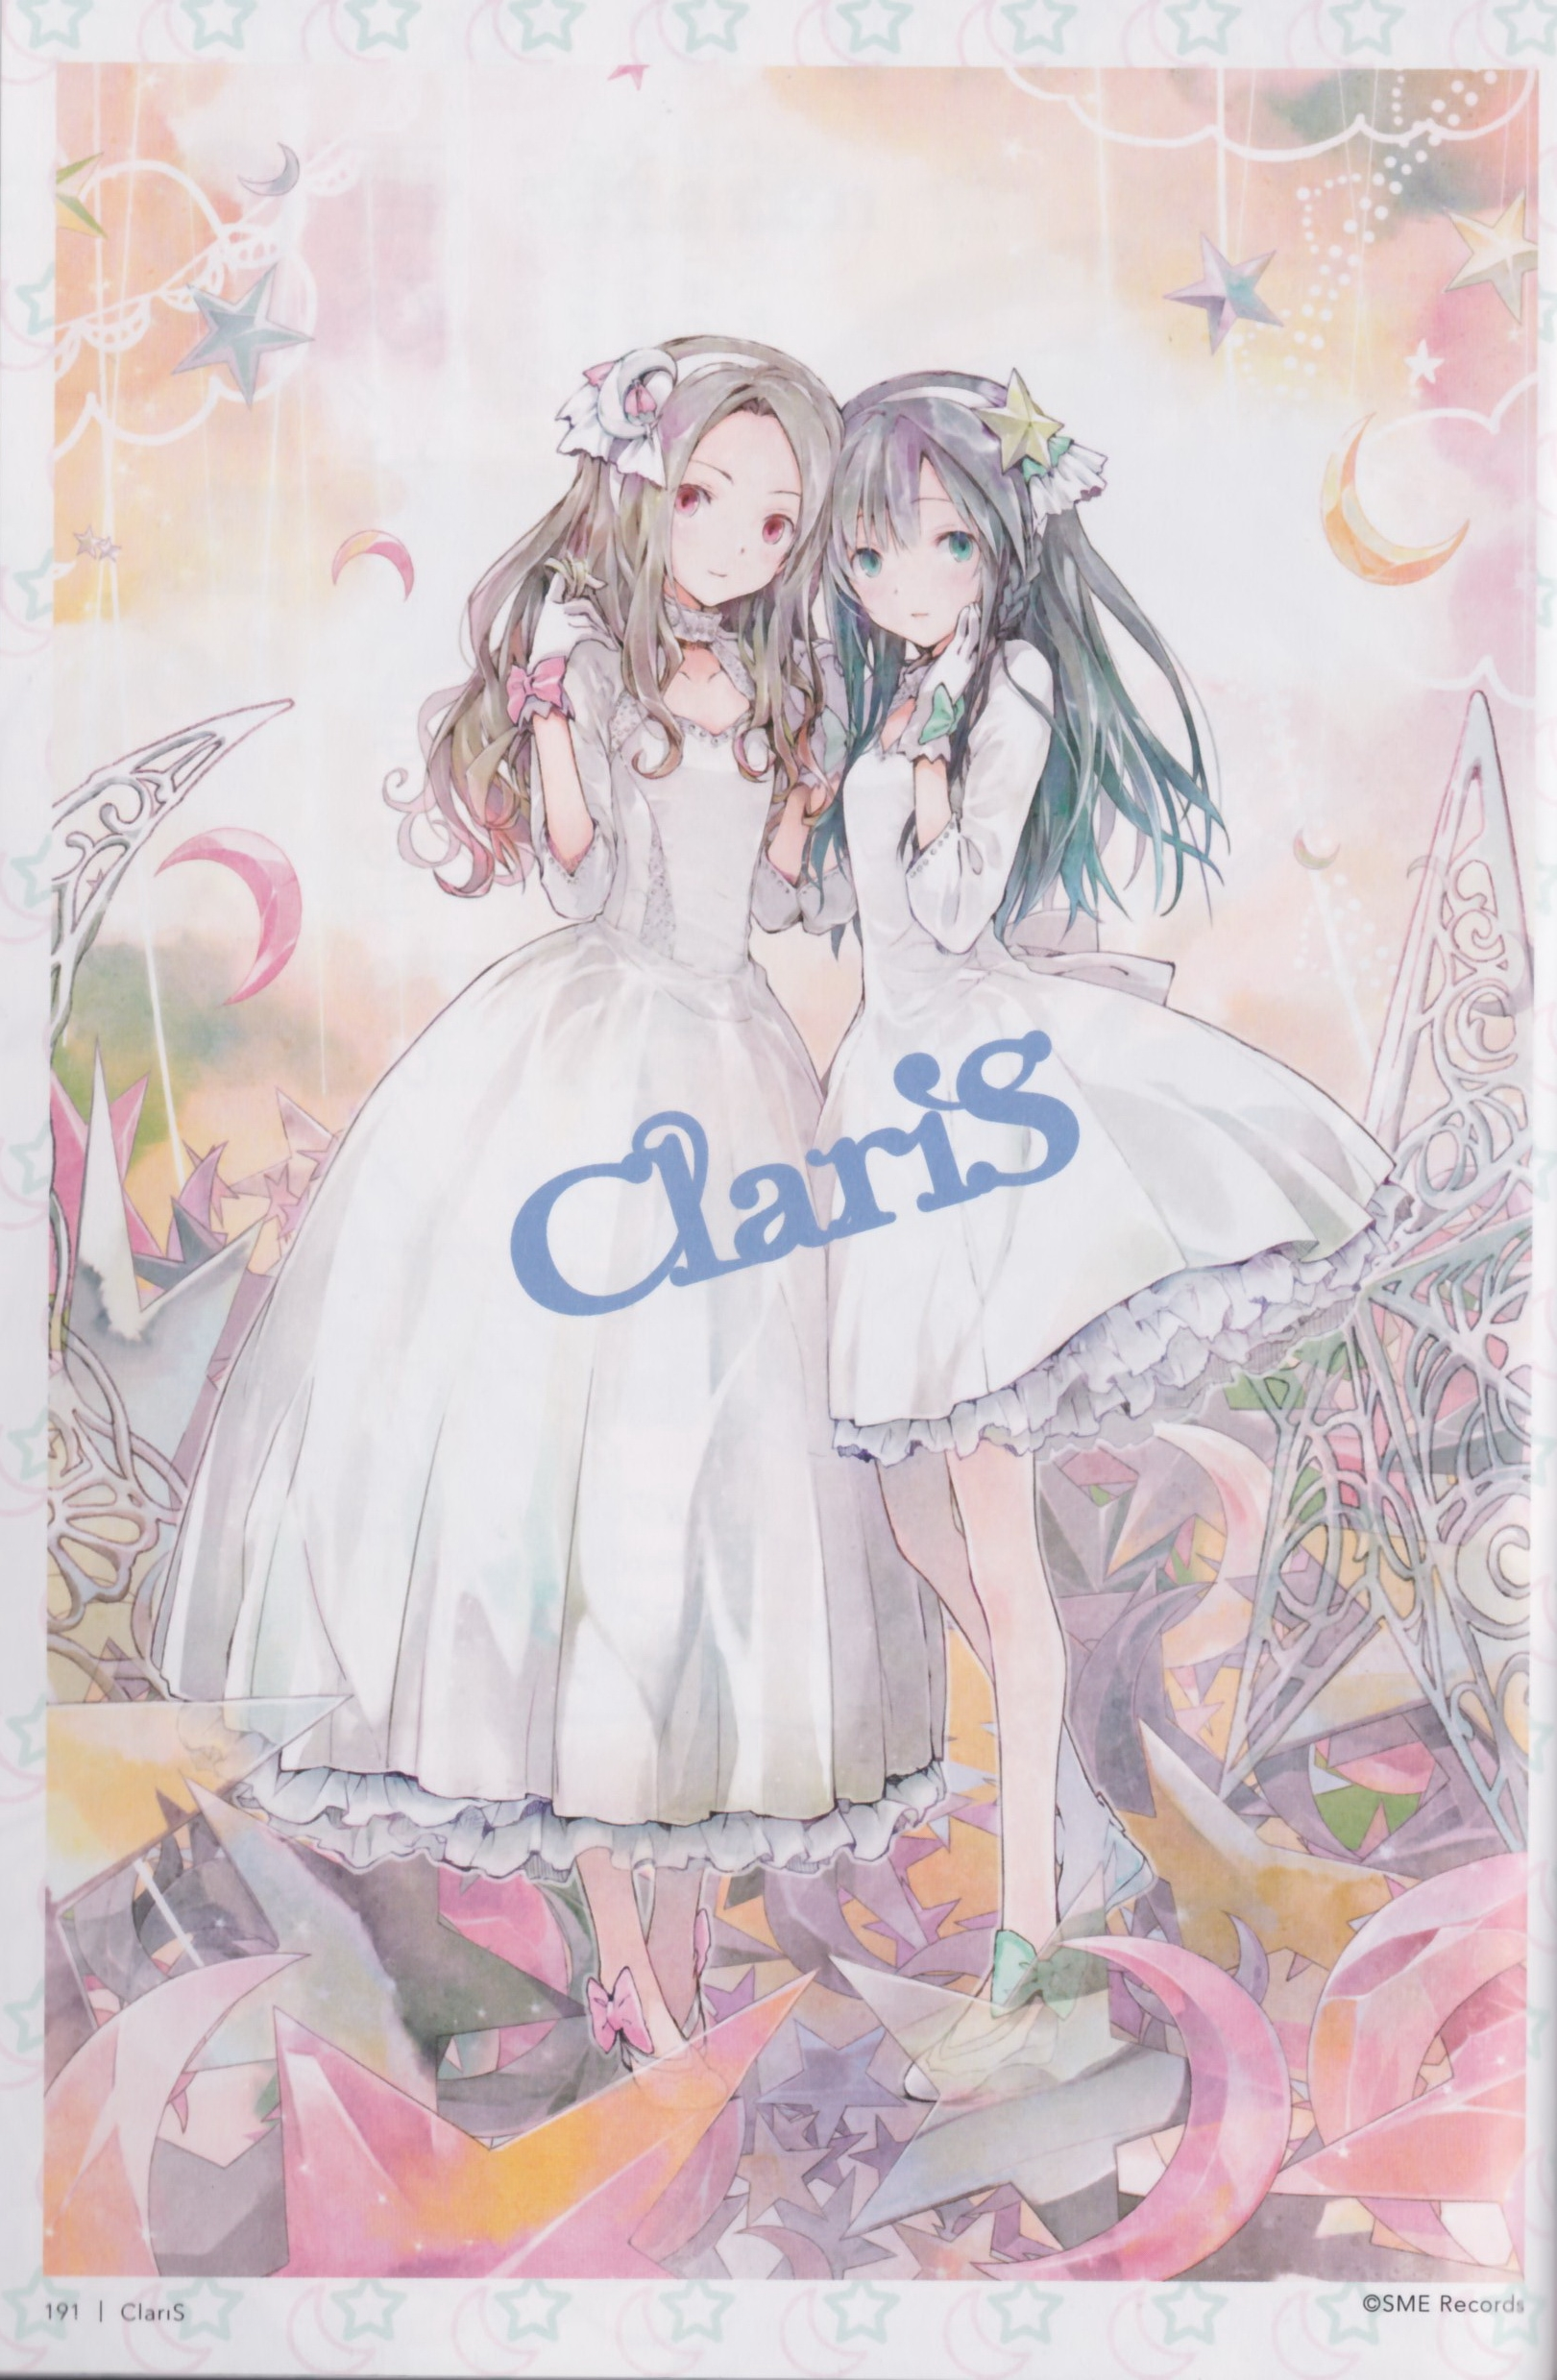 Claris mp3 download - musicslackrnet